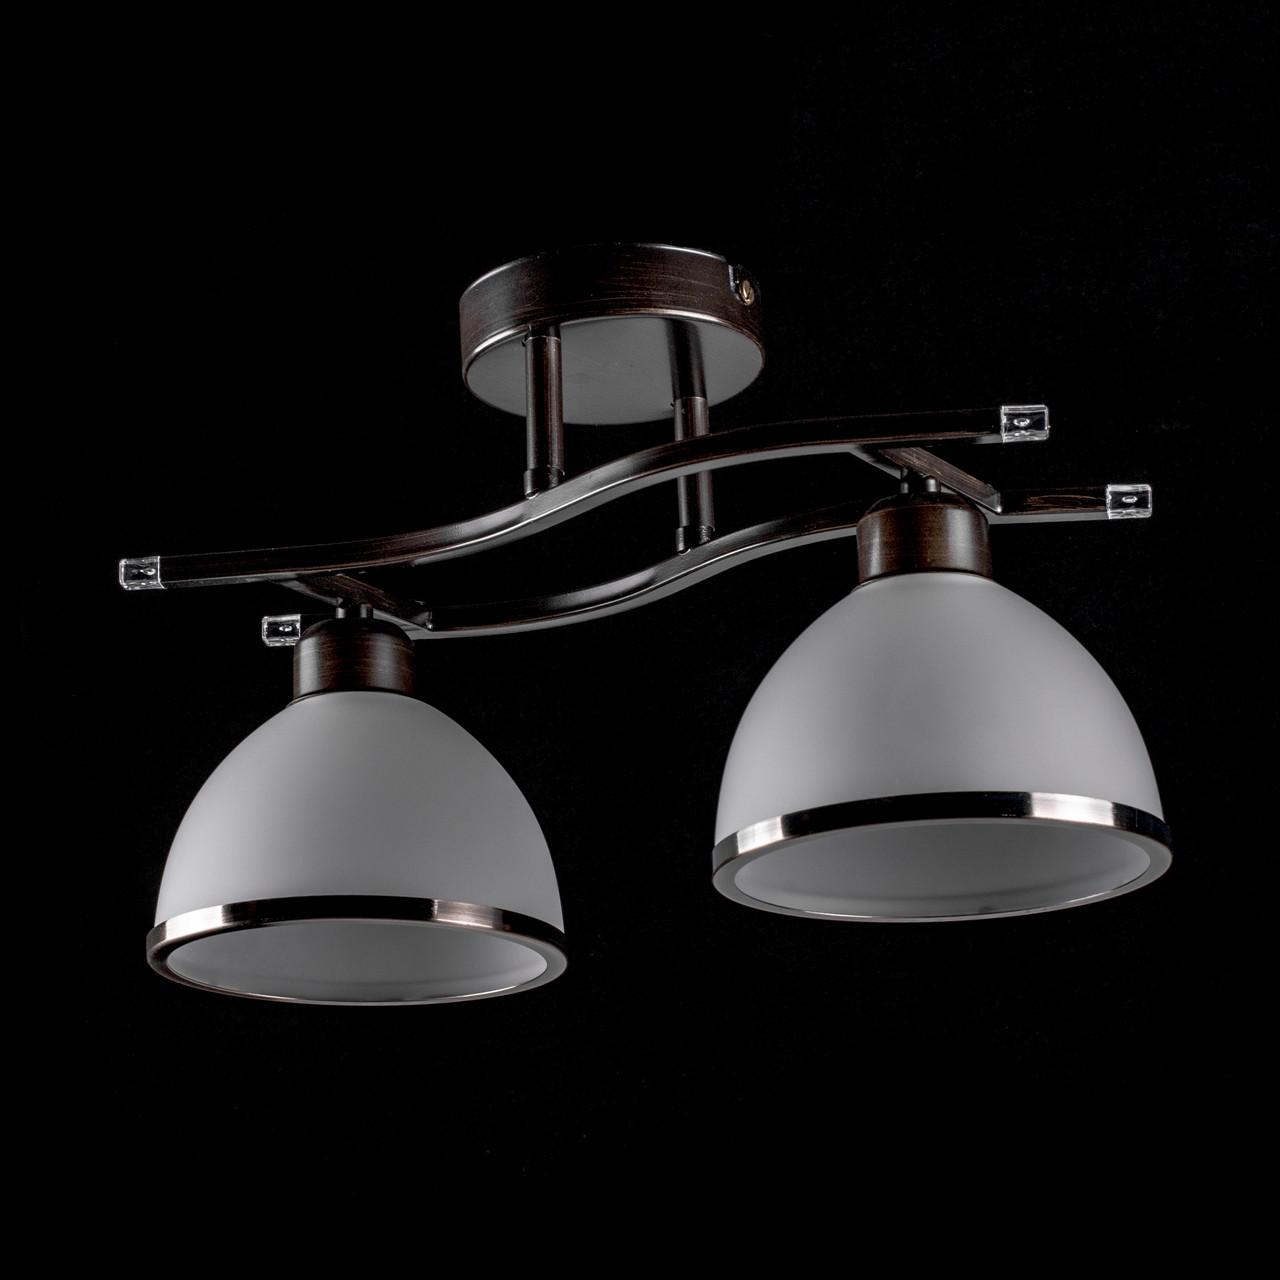 Потолочная люстра на две лампочки (венге) P3-1300/2C/WENGE+WT